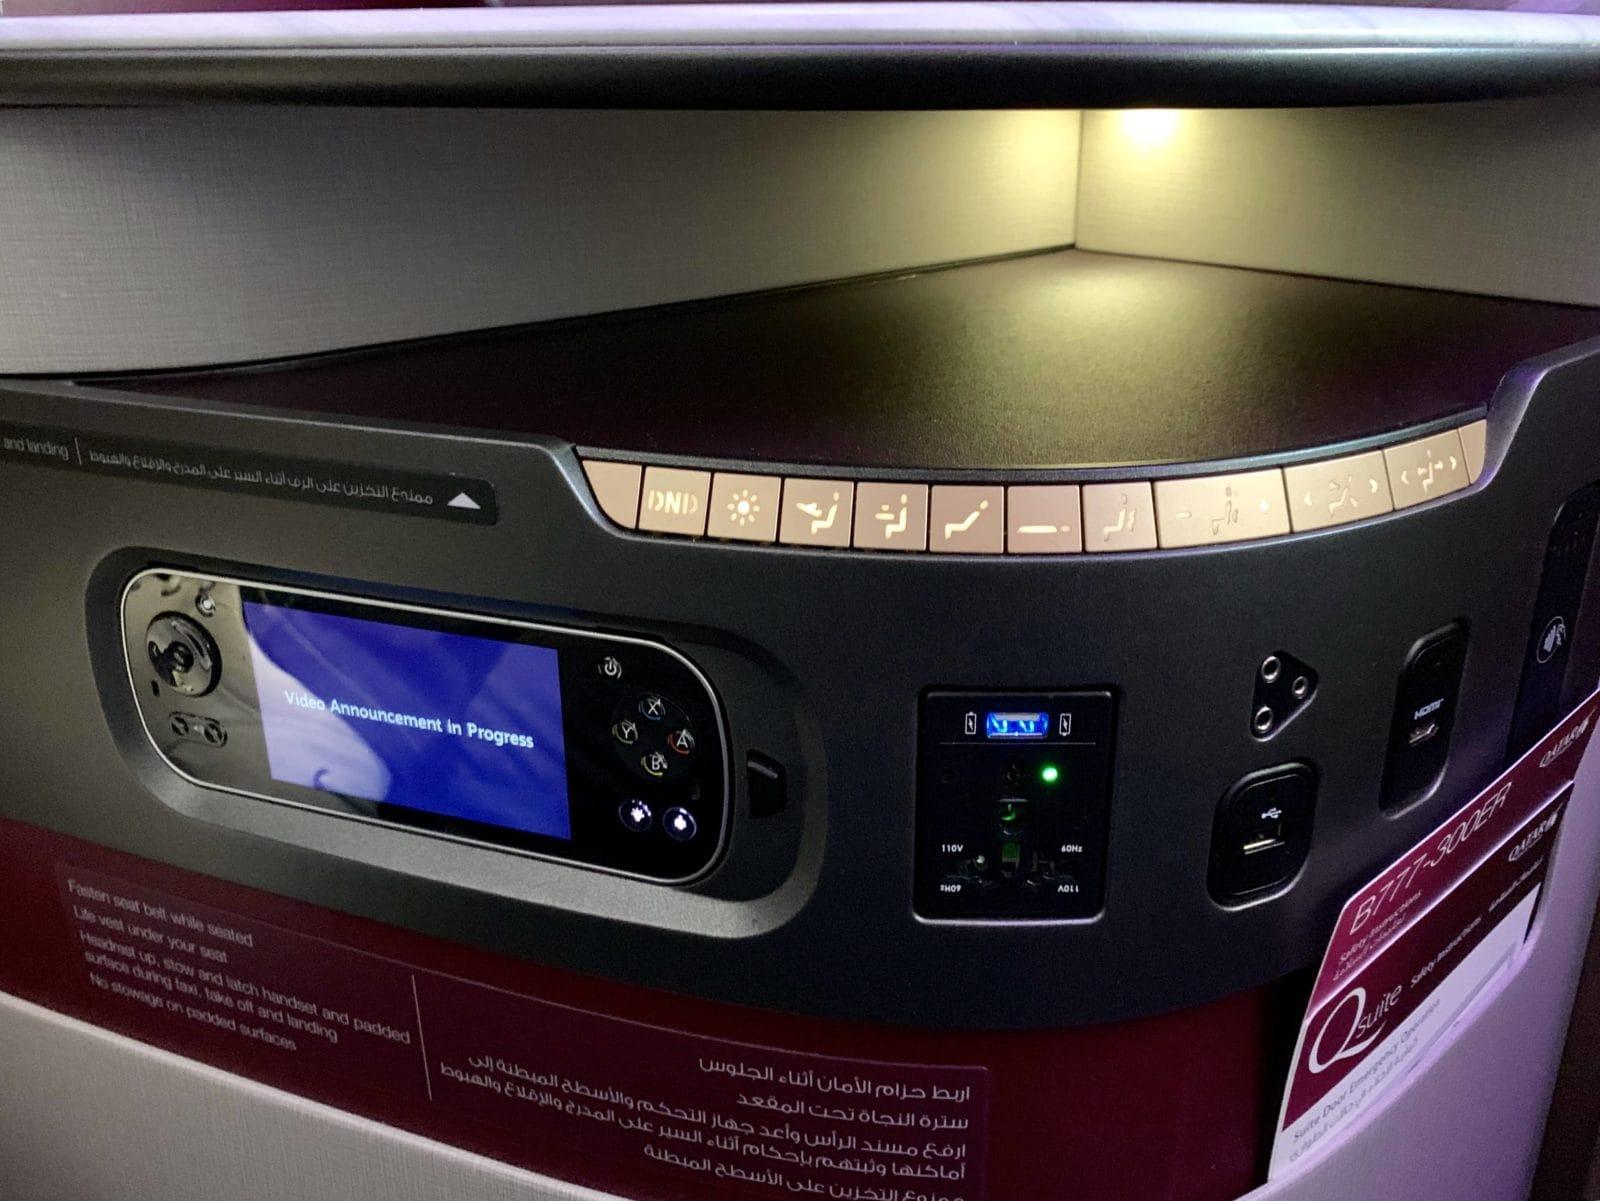 Qatar Airways Qsuite Boeing 777-300ER Knoepfe